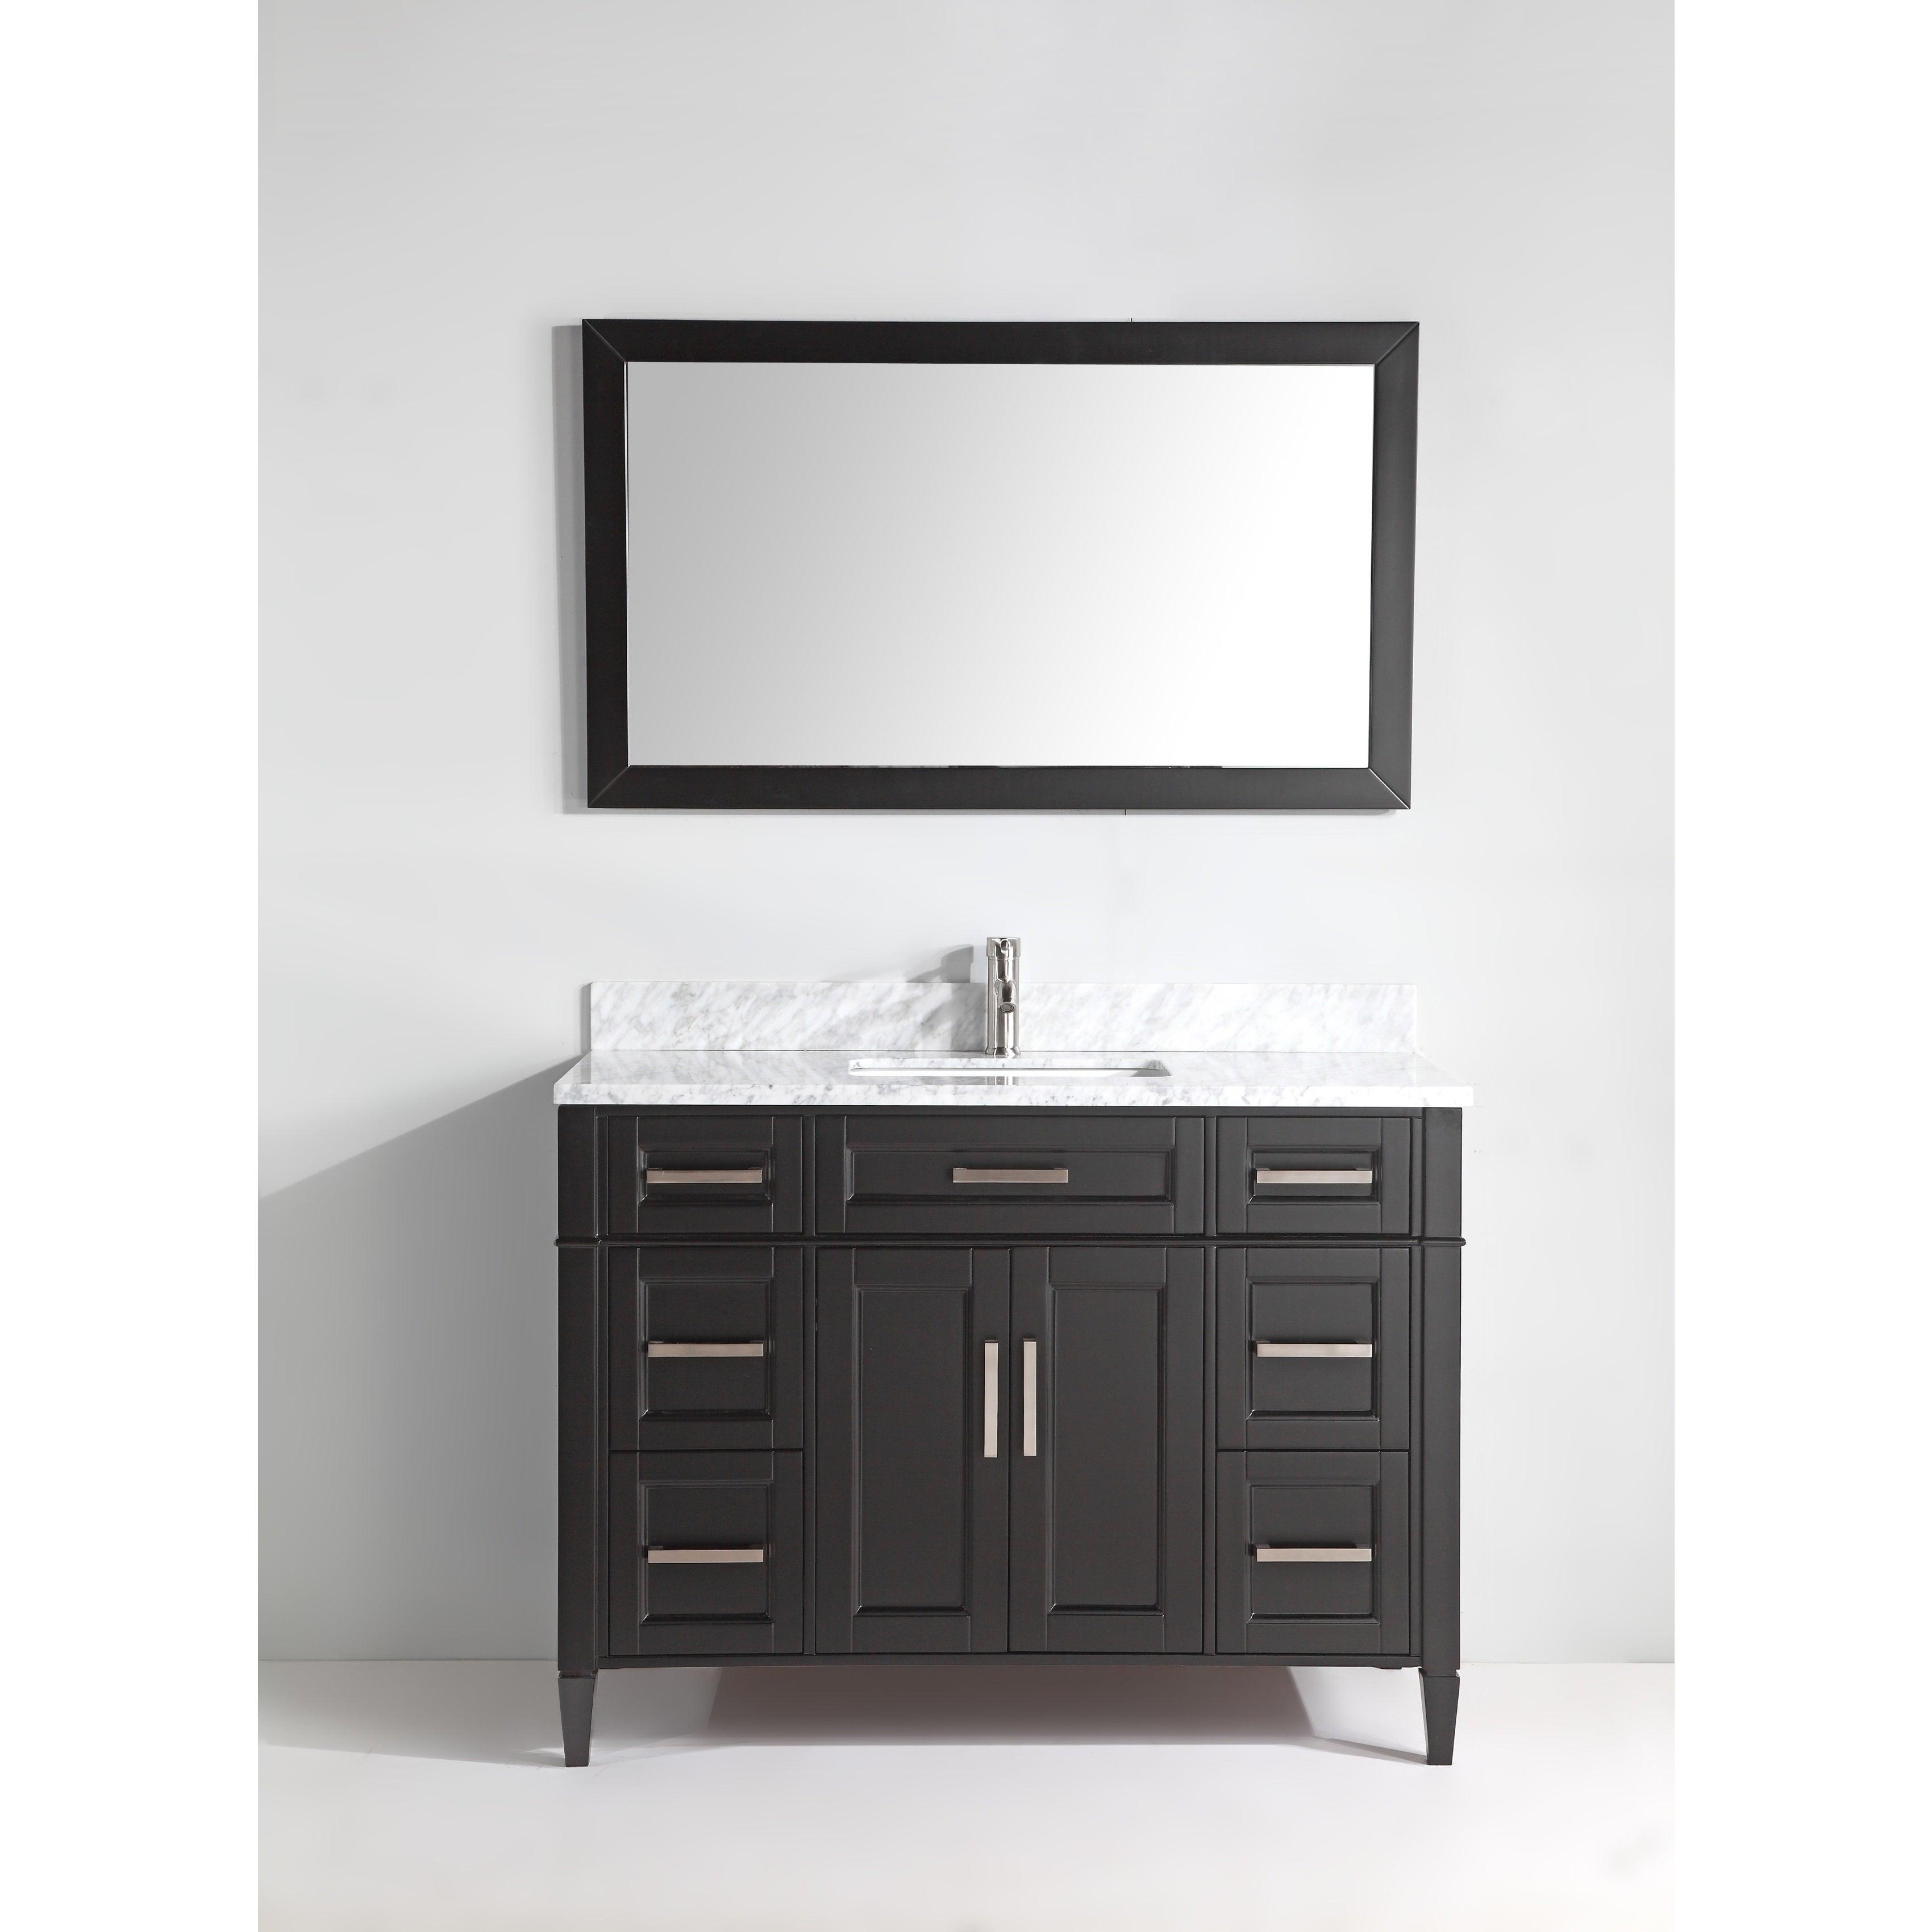 Vanity Art 60 Inch Bathroom Vanity Set With